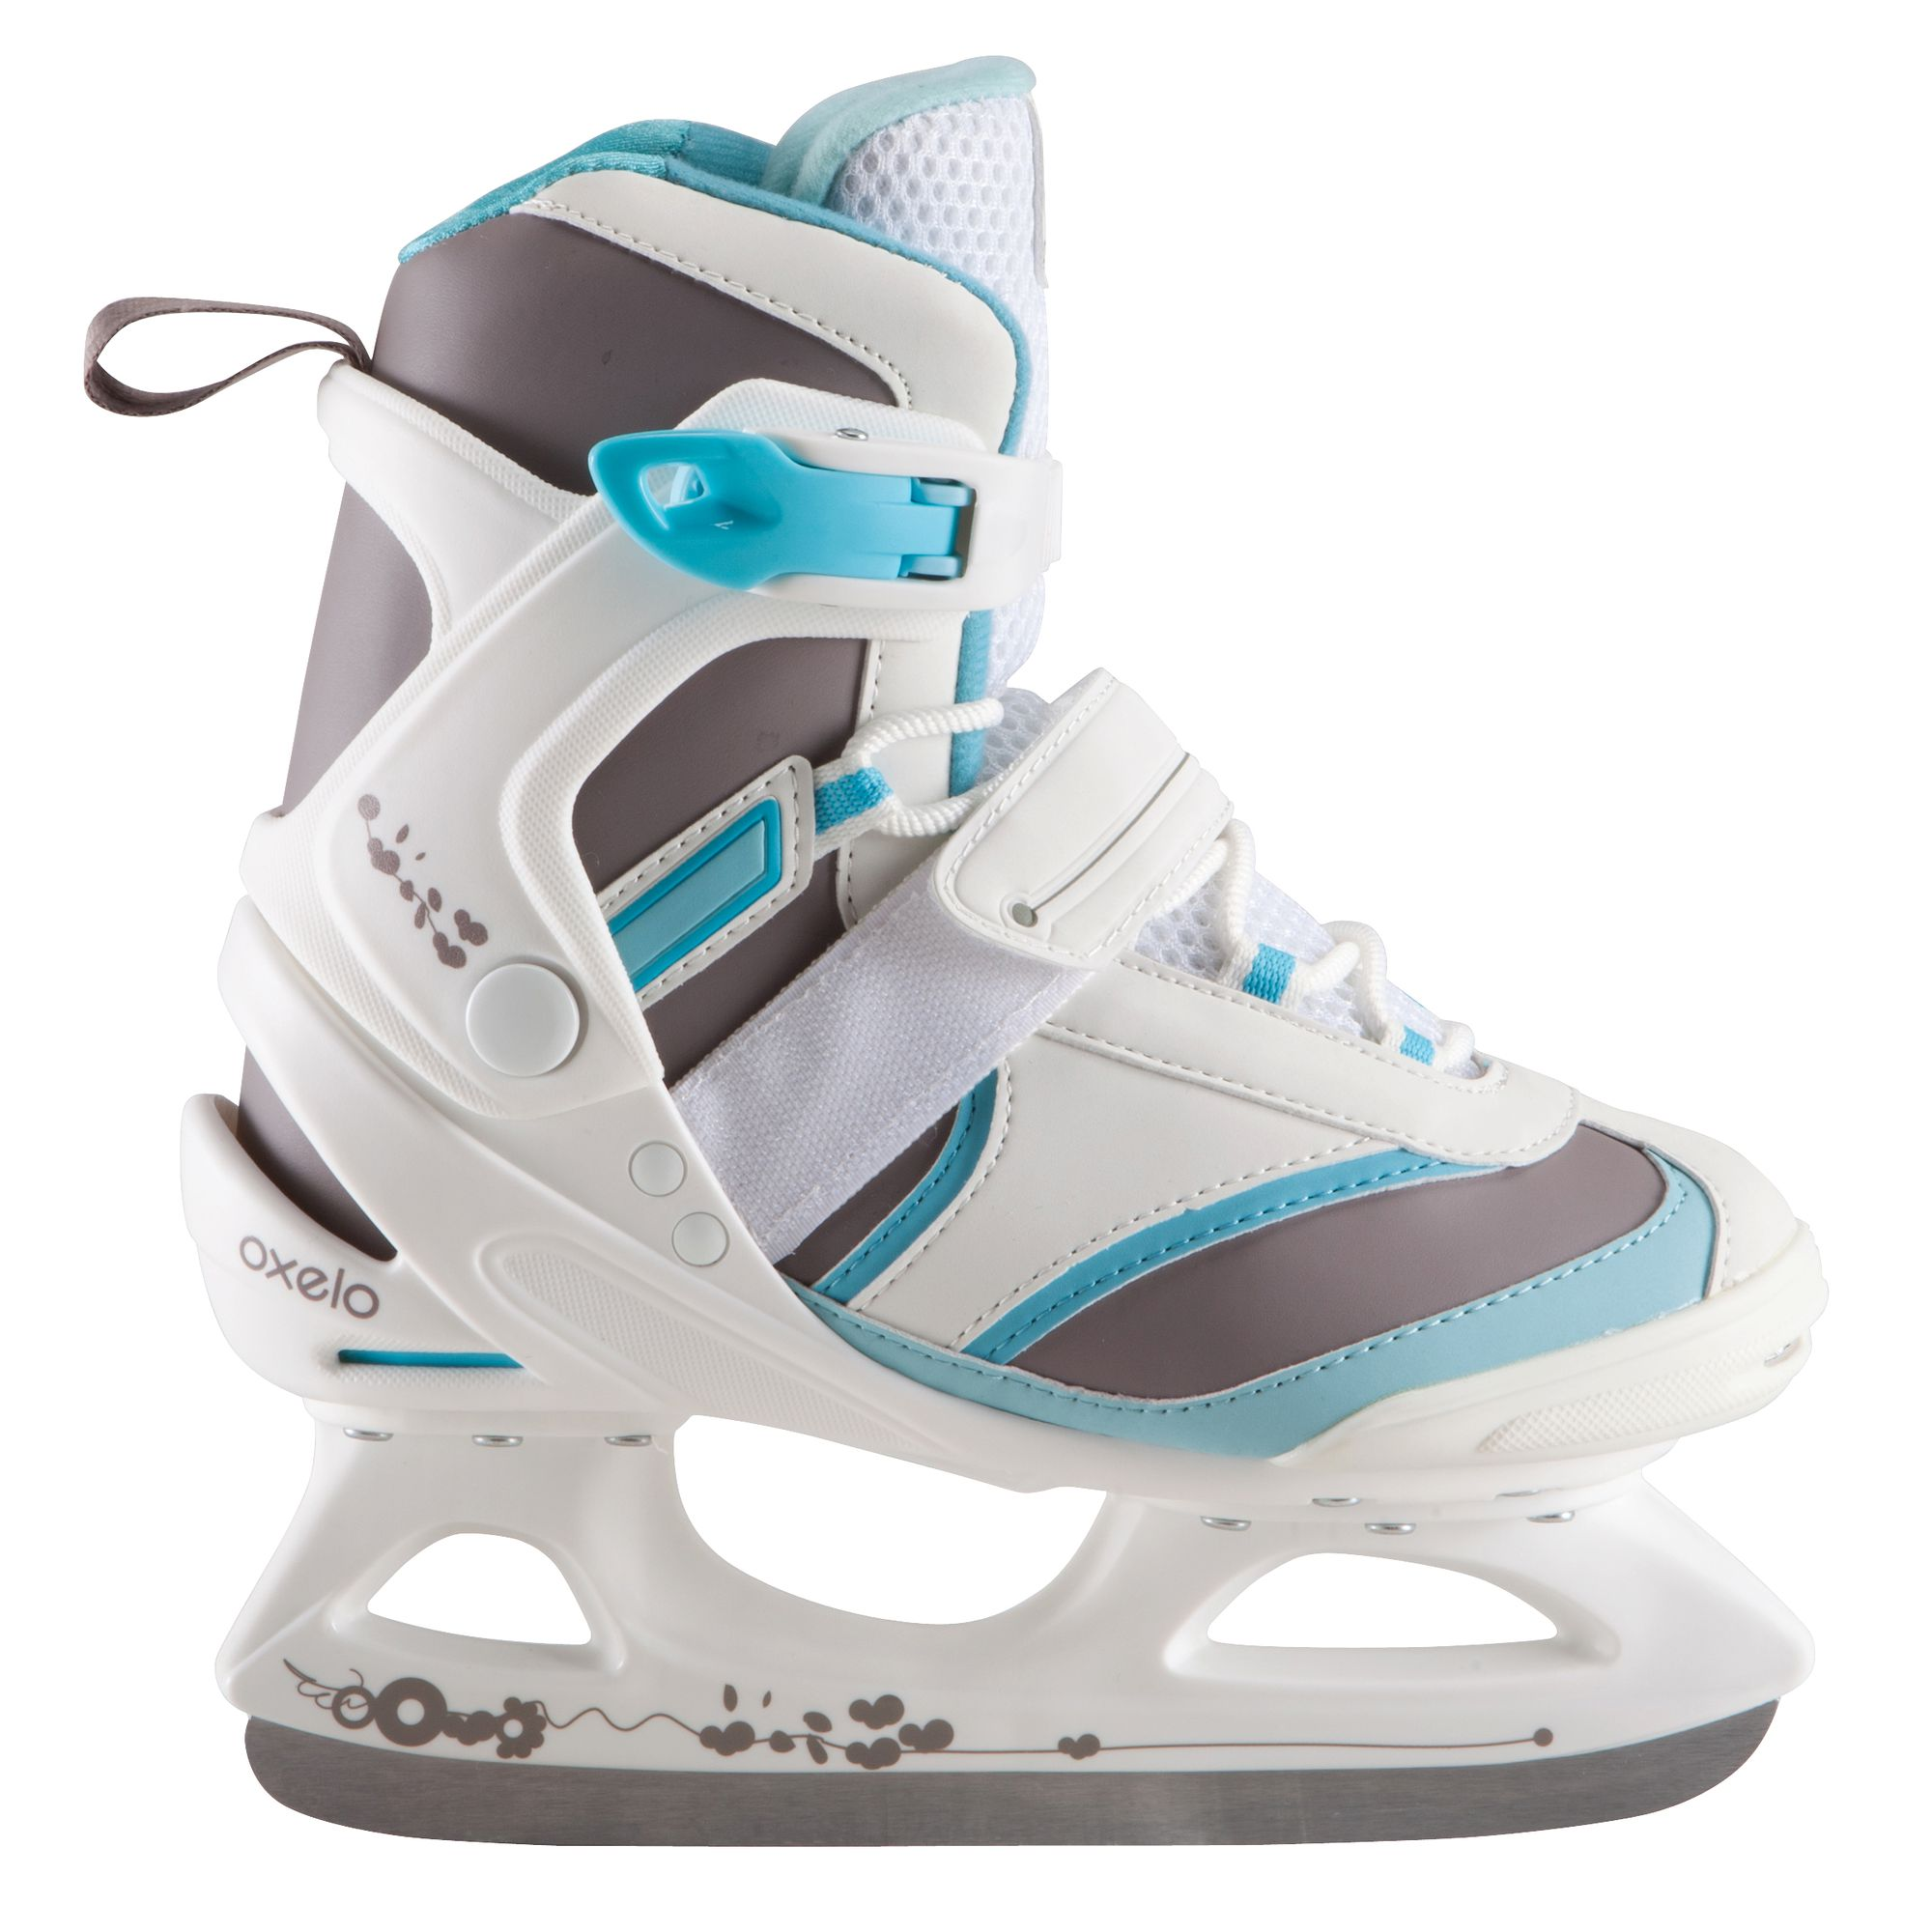 patin a glace fit 3 femme blanc bleu clubs. Black Bedroom Furniture Sets. Home Design Ideas